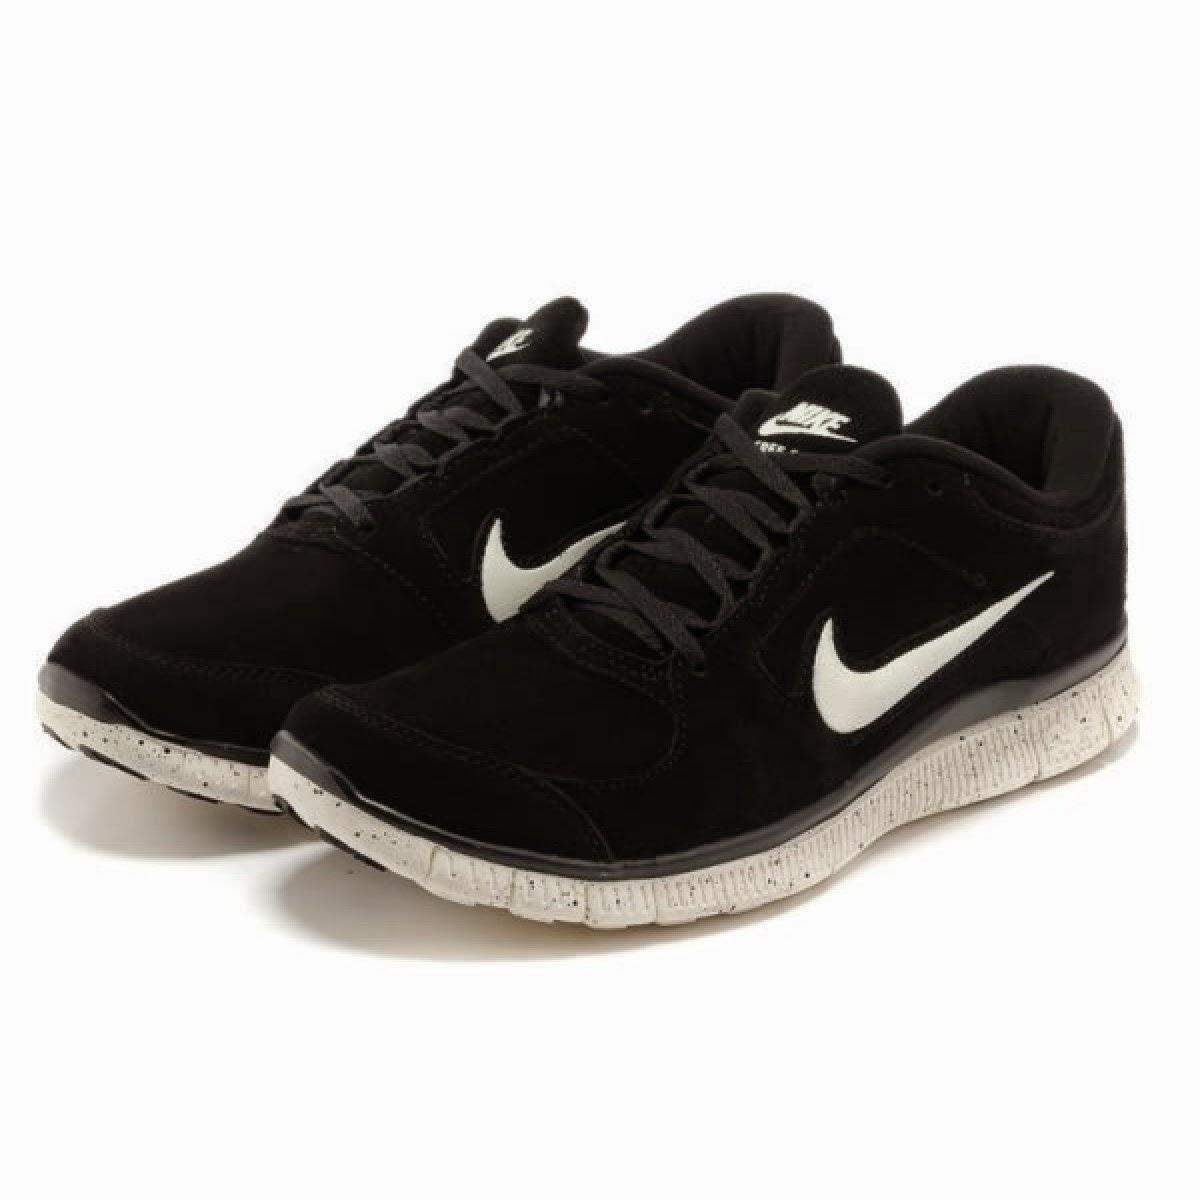 Nike Free Women Blacknike Free Womens Blacknike Free Run Women